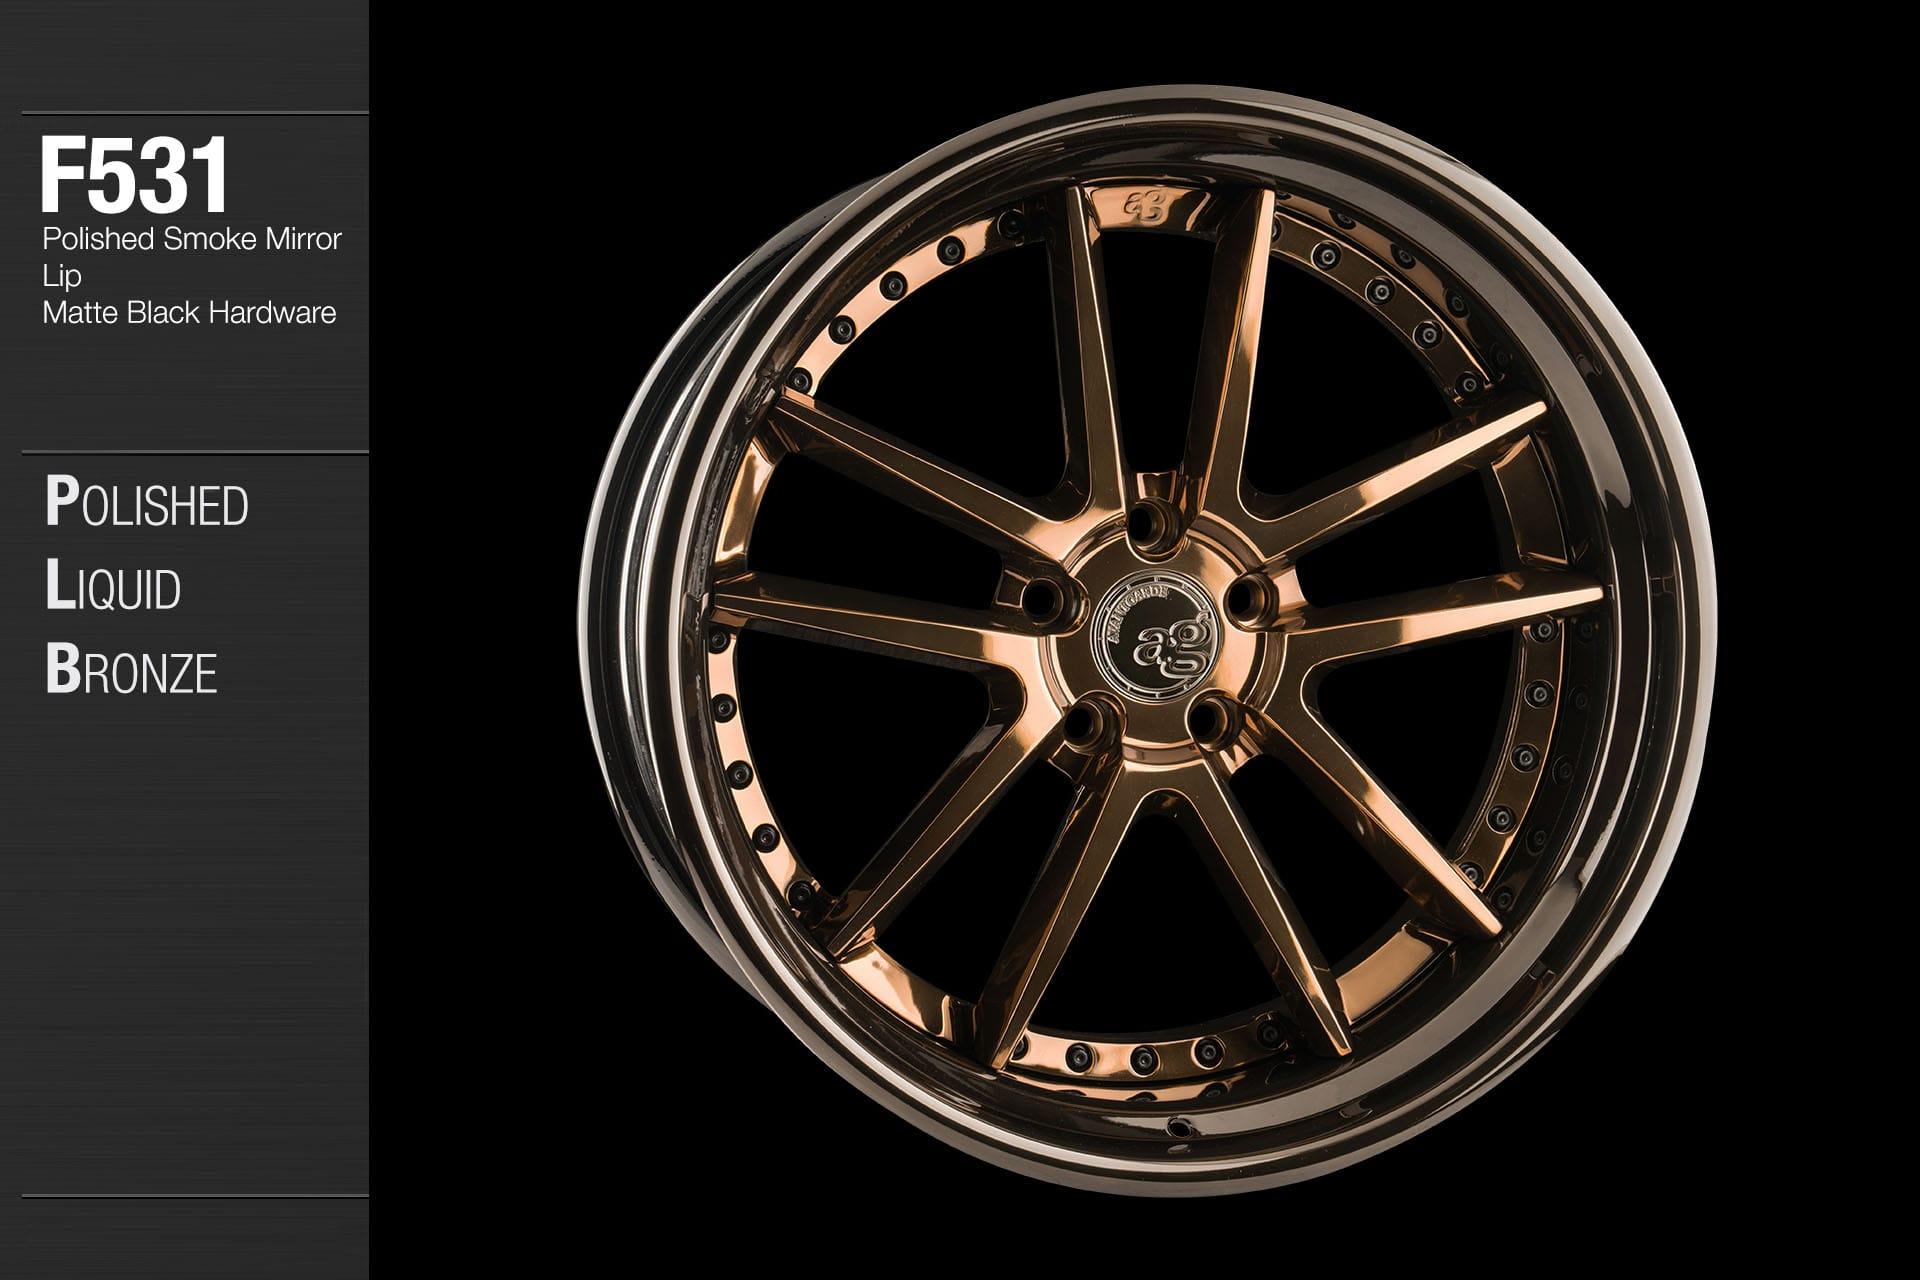 avant-garde-ag-wheels-f531-polished-liquid-bronze-face-smoke-mirror-lip-matte-black-hardware-4-min